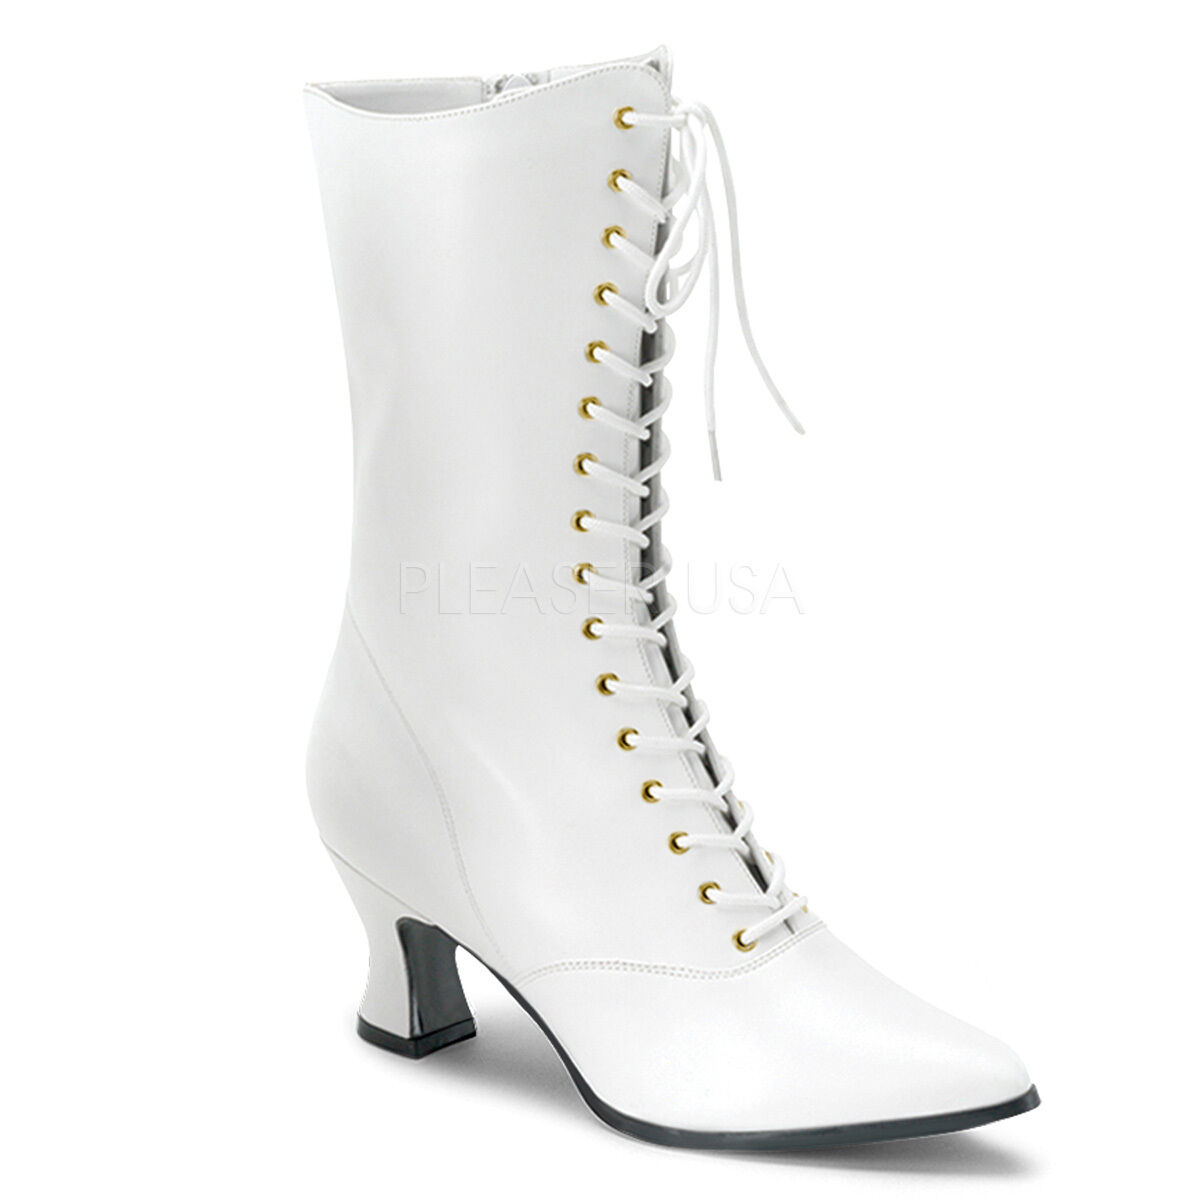 Funtasma Victorian 120 Weiß Faux Leder Kitten Heel Lace-Up Front Ankle Stiefel